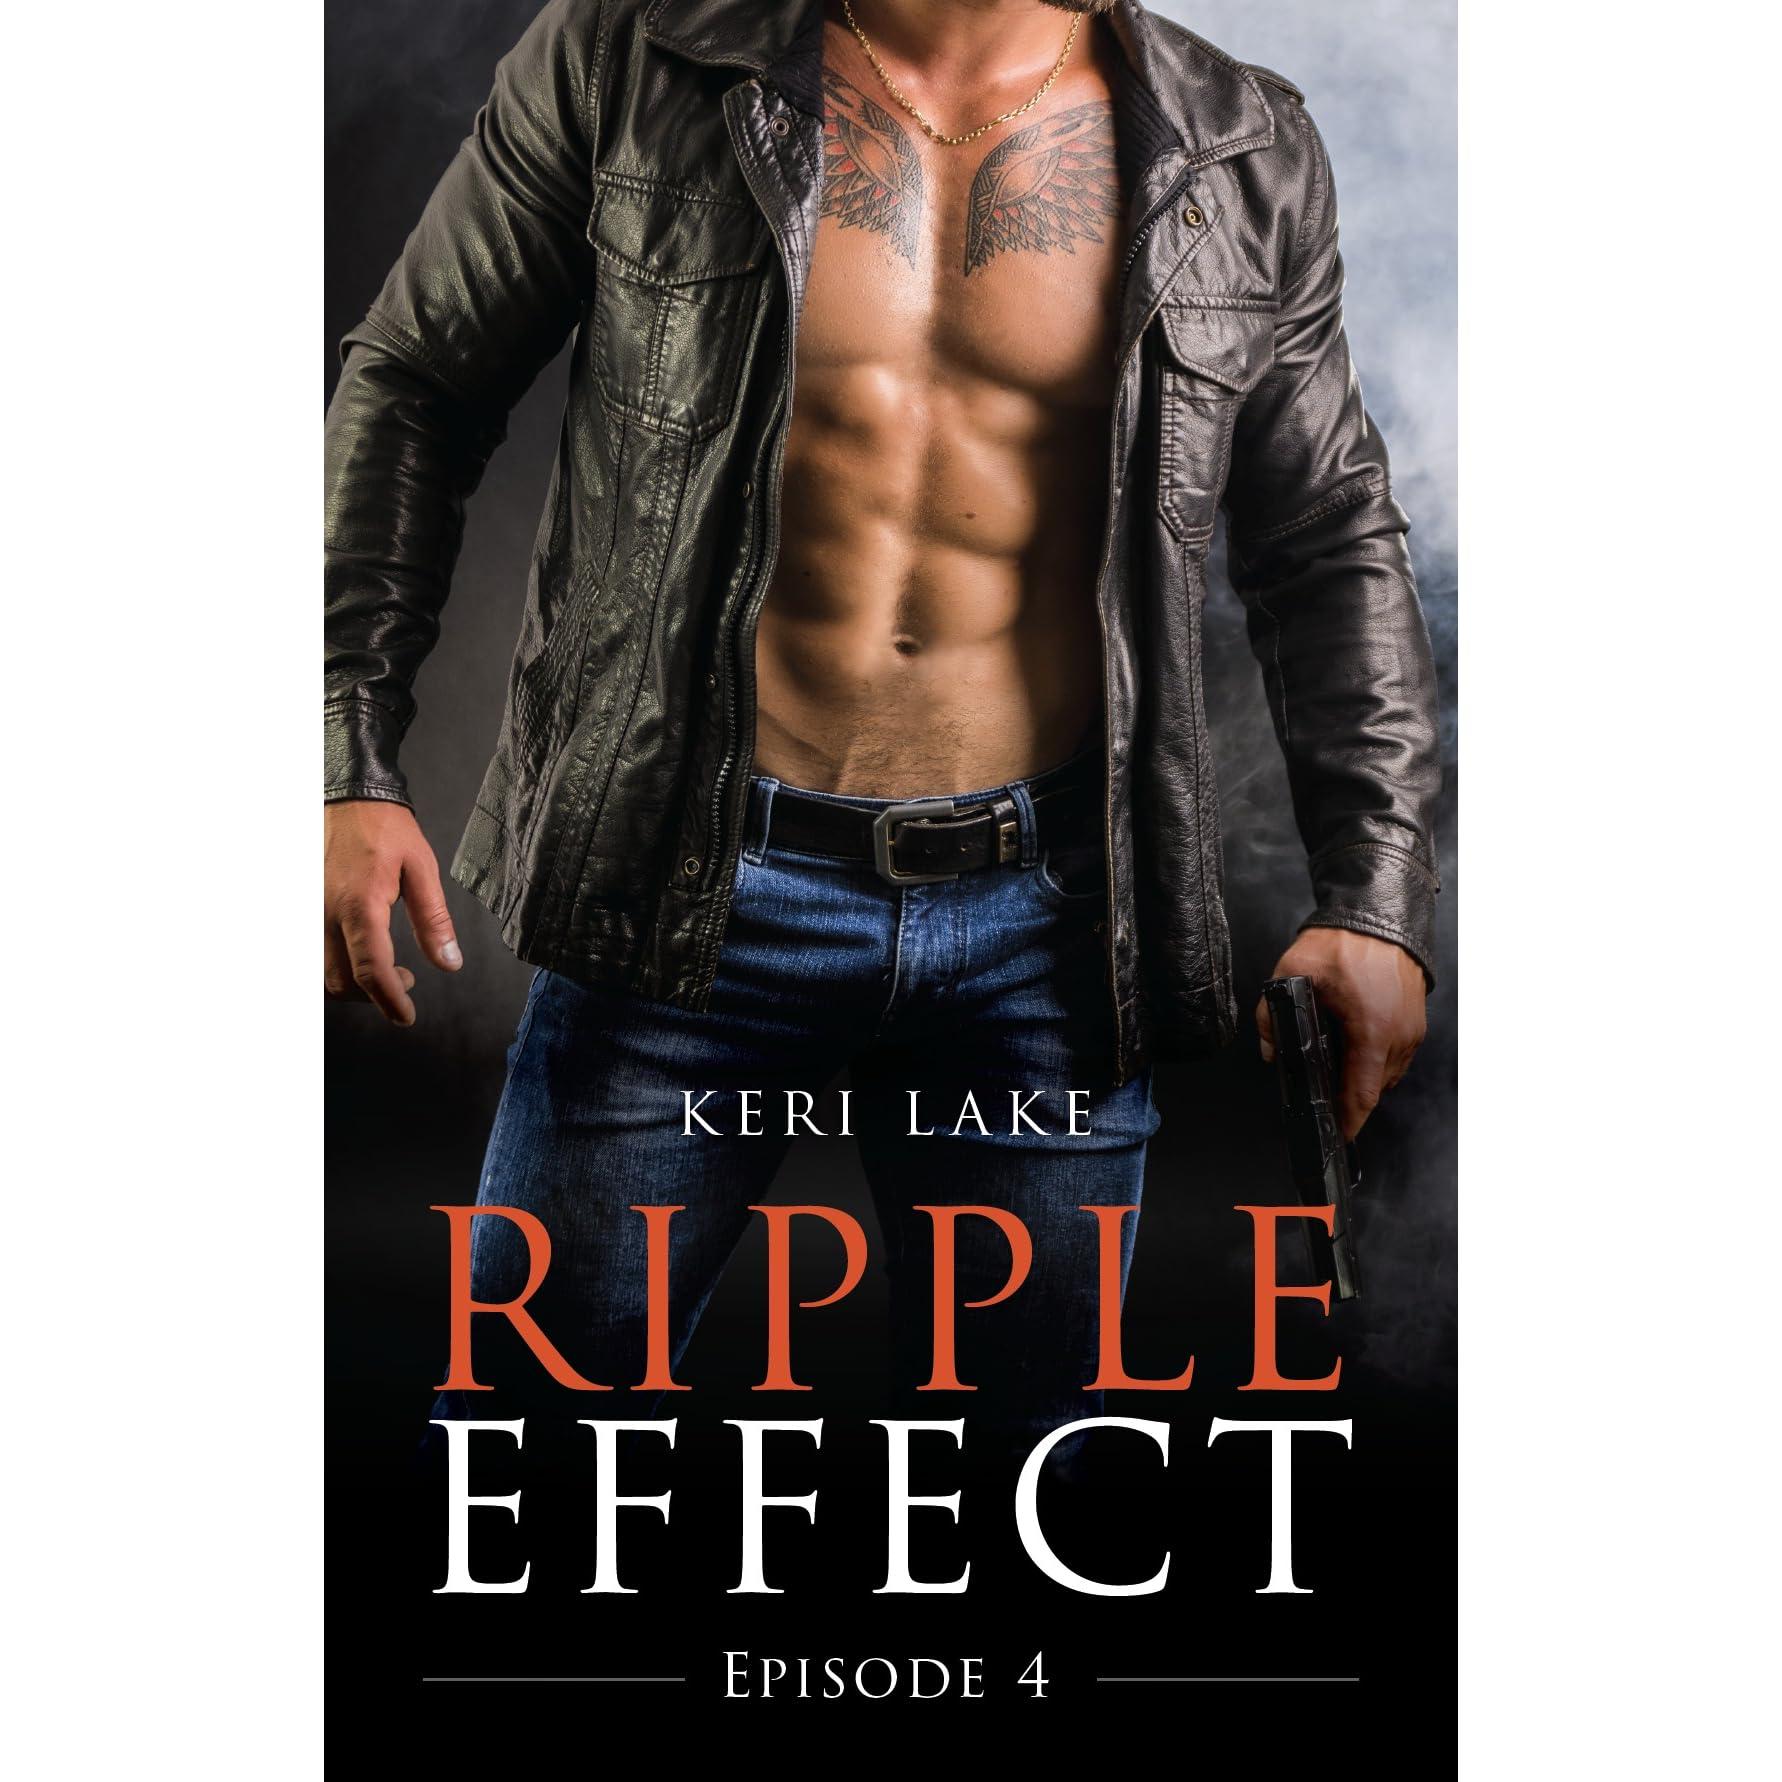 Ripple Effect Episode 4 Ripple Effect 4 By Keri Lake